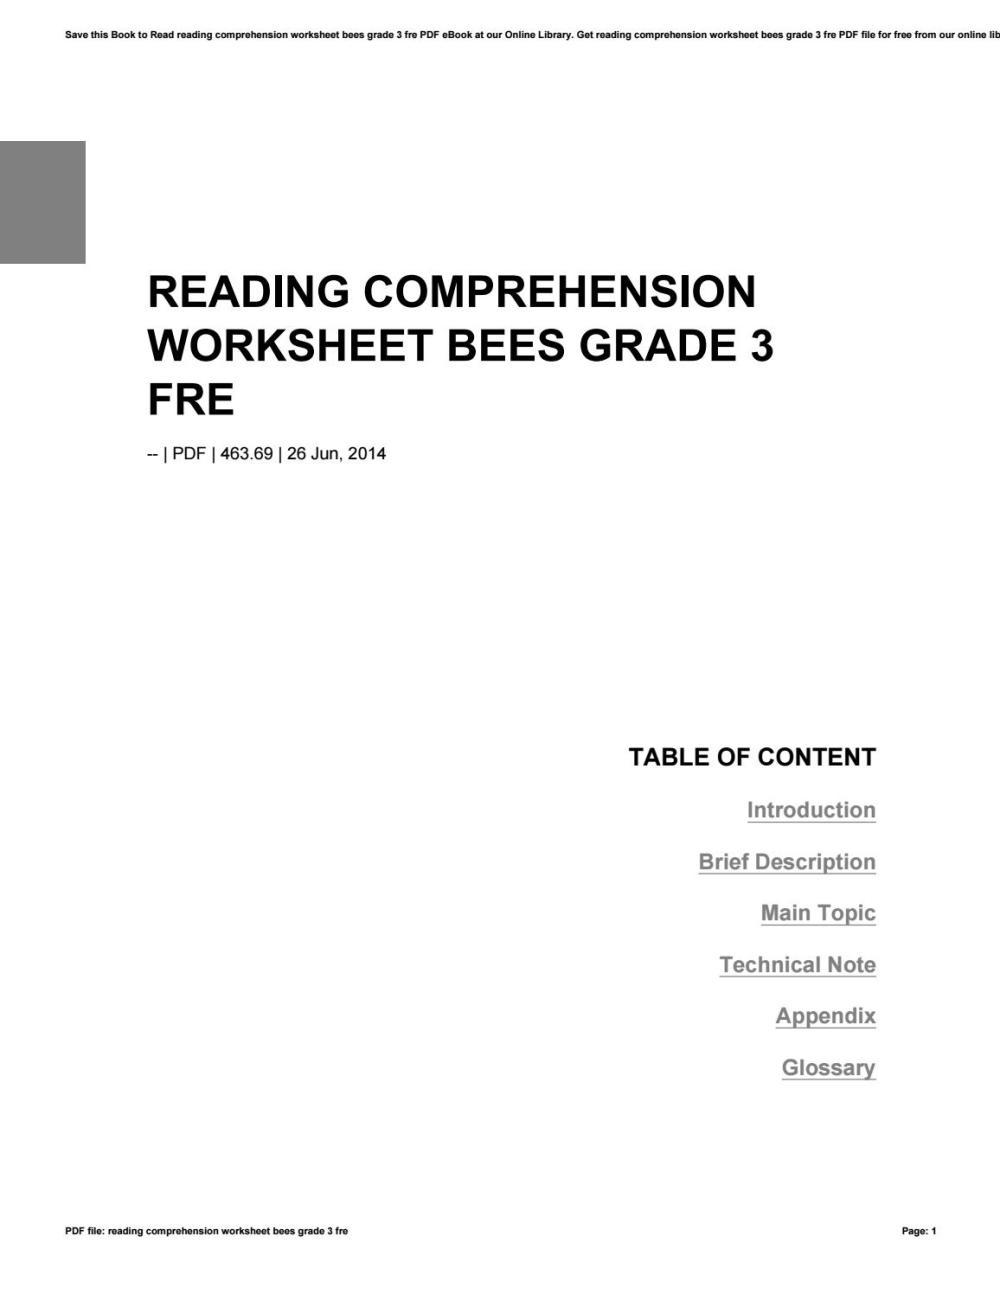 medium resolution of Reading comprehension worksheet bees grade 3 fre by dimas435anggara - issuu